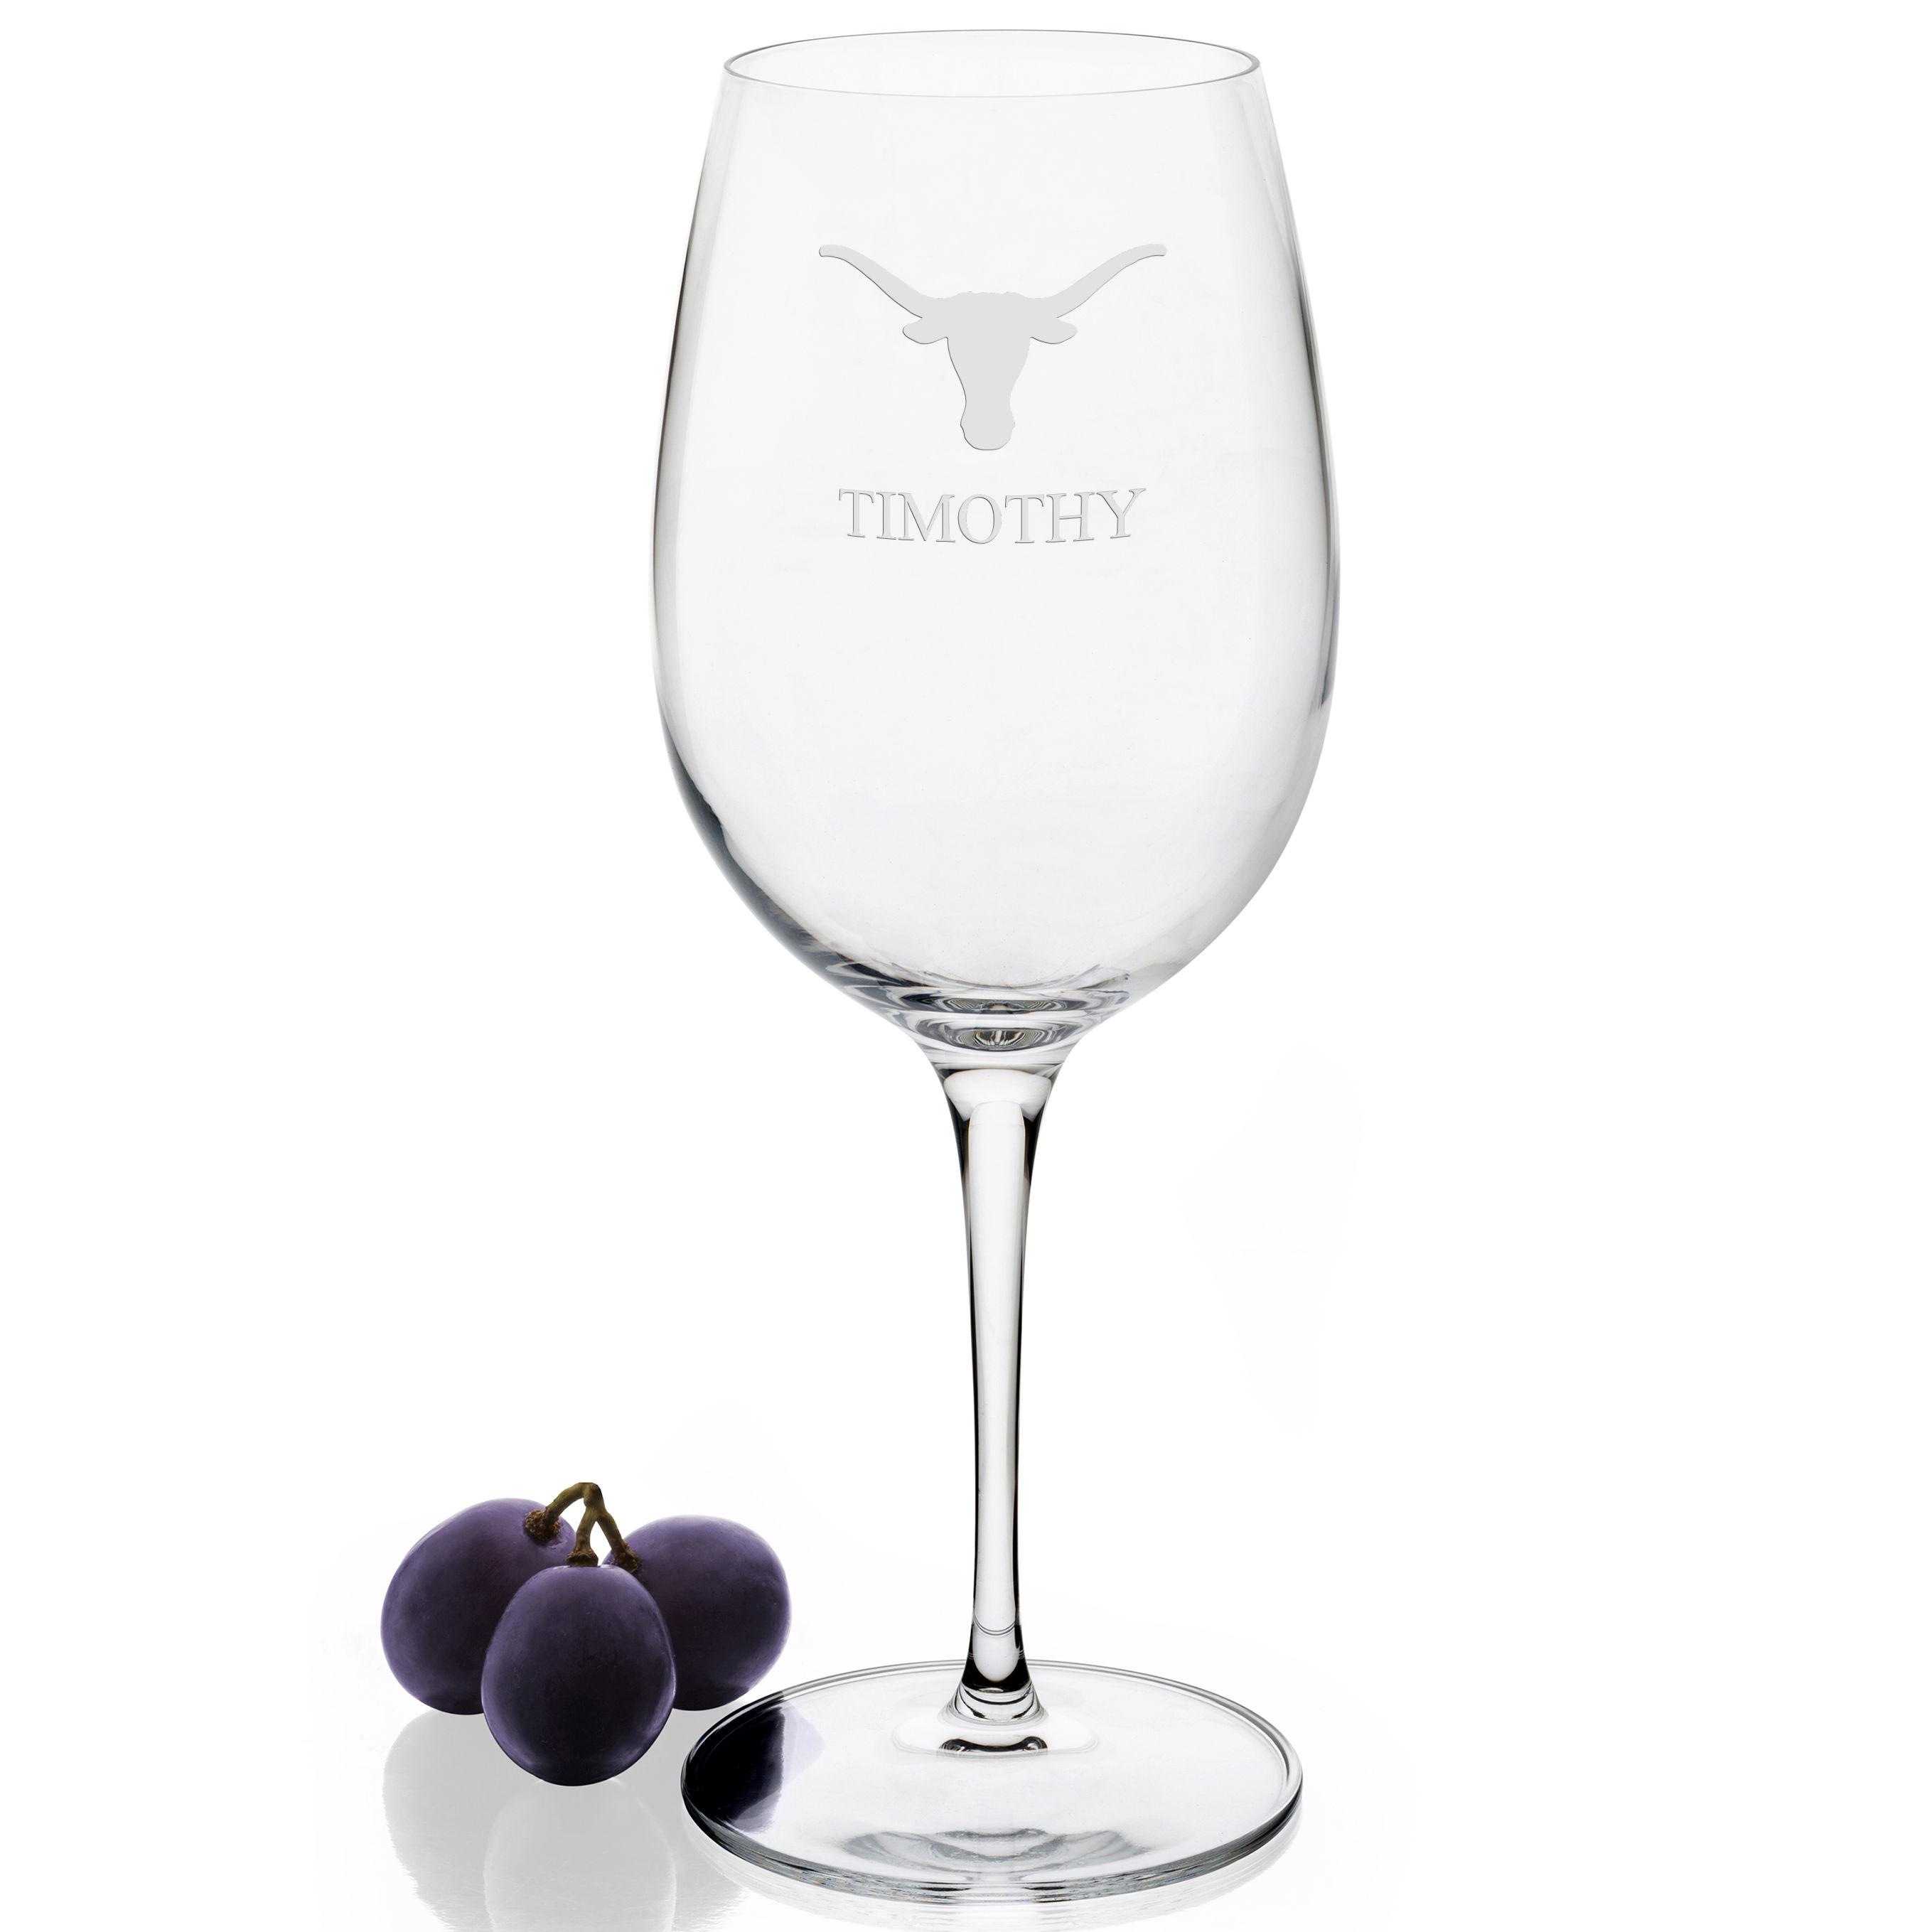 University of Texas Red Wine Glasses - Set of 4 - Image 2